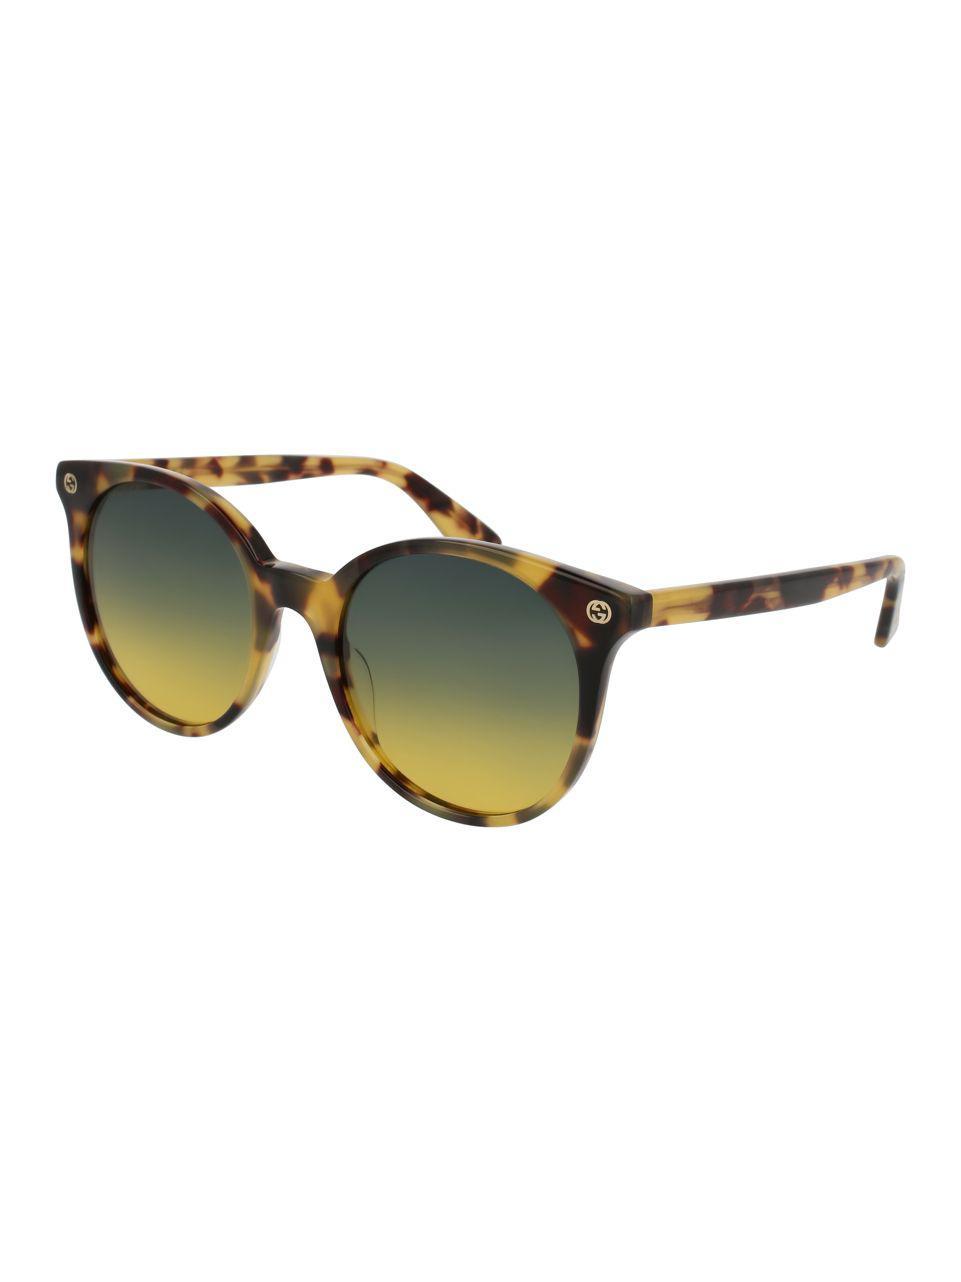 0c6d3a28537 Lyst - Gucci 50mm Gg0091s Round Sunglasses